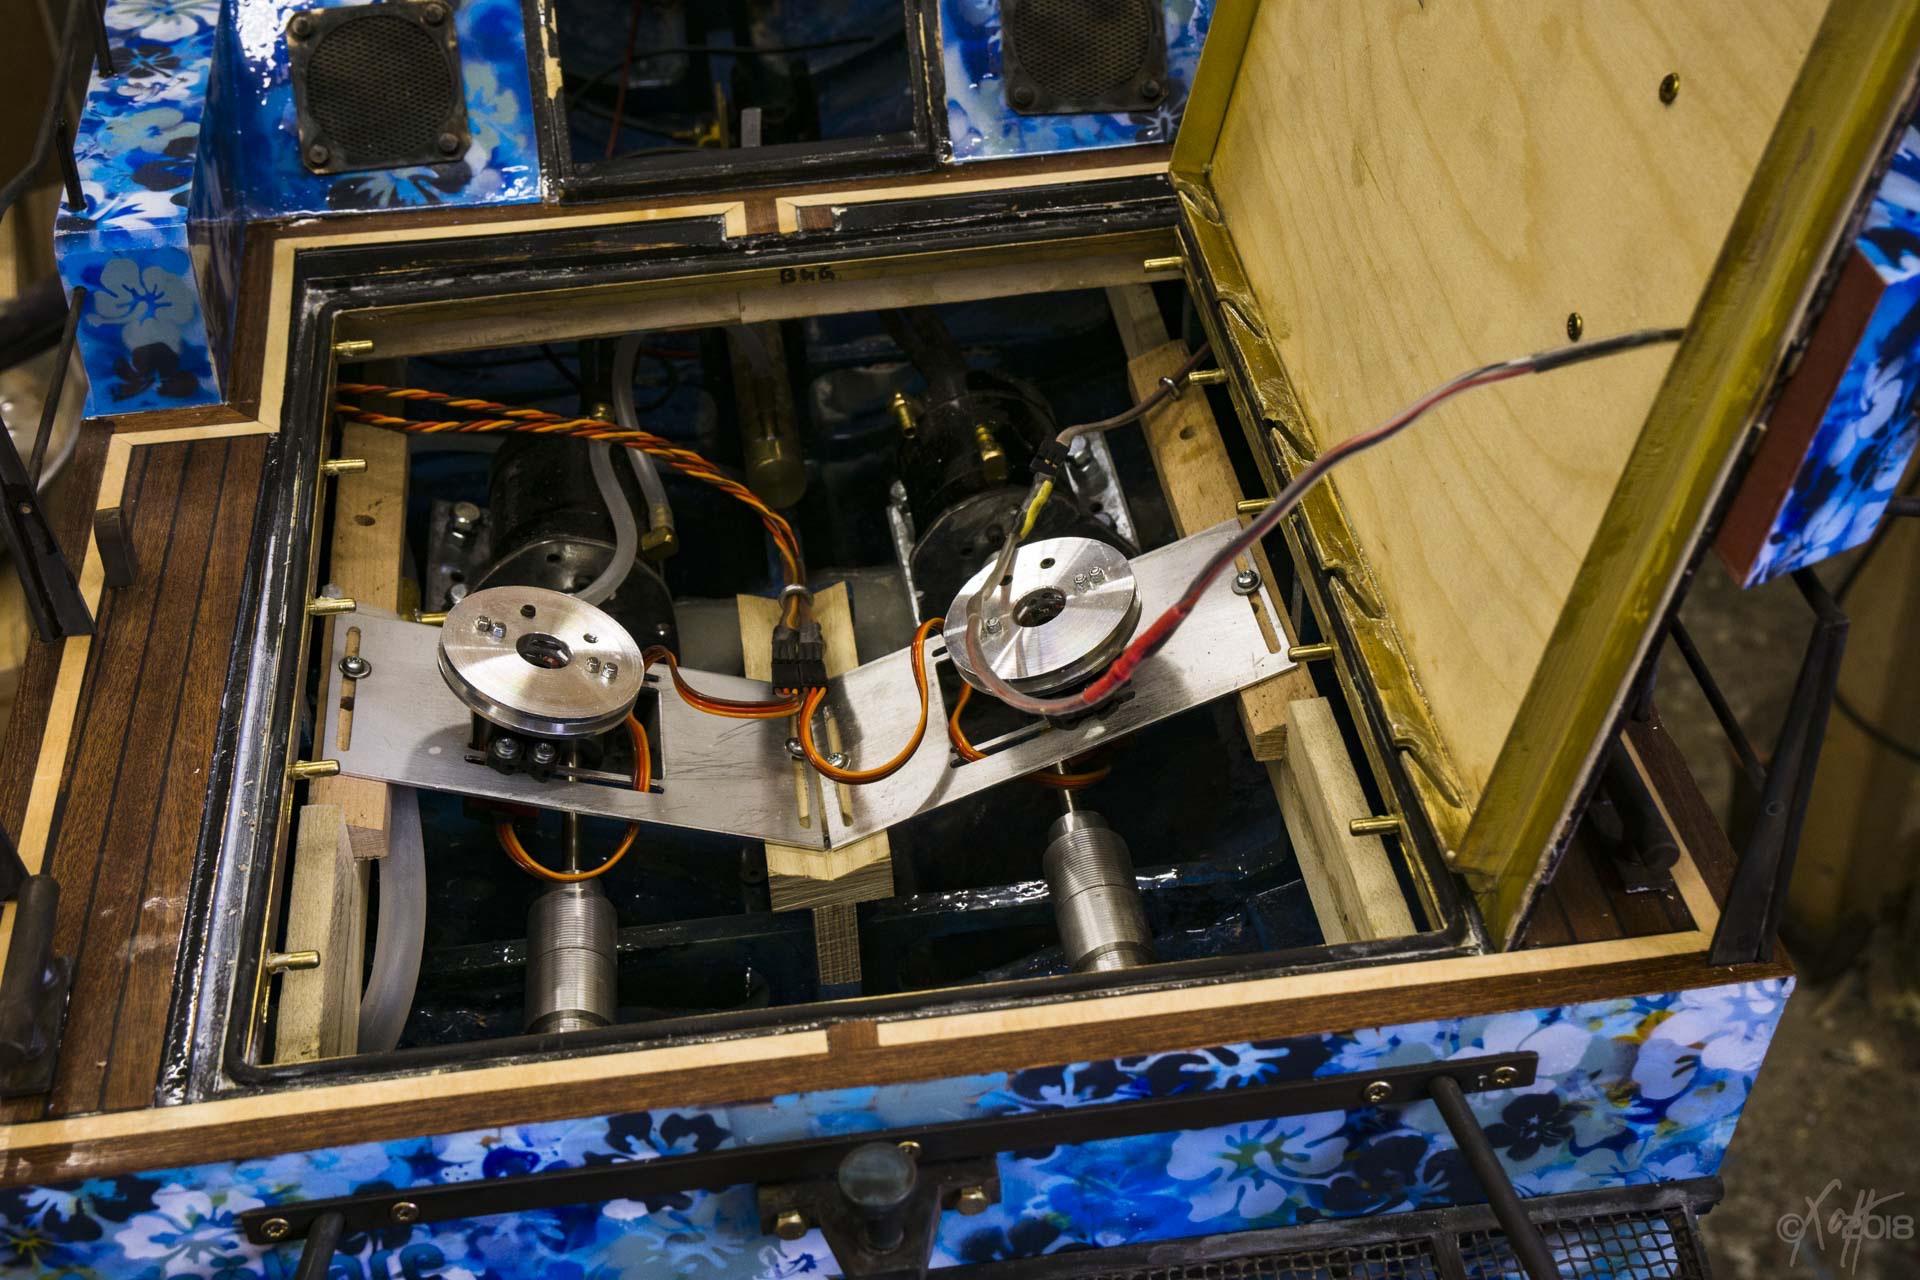 571_Stridsbat90_Elektrik_DSC06676.JPG